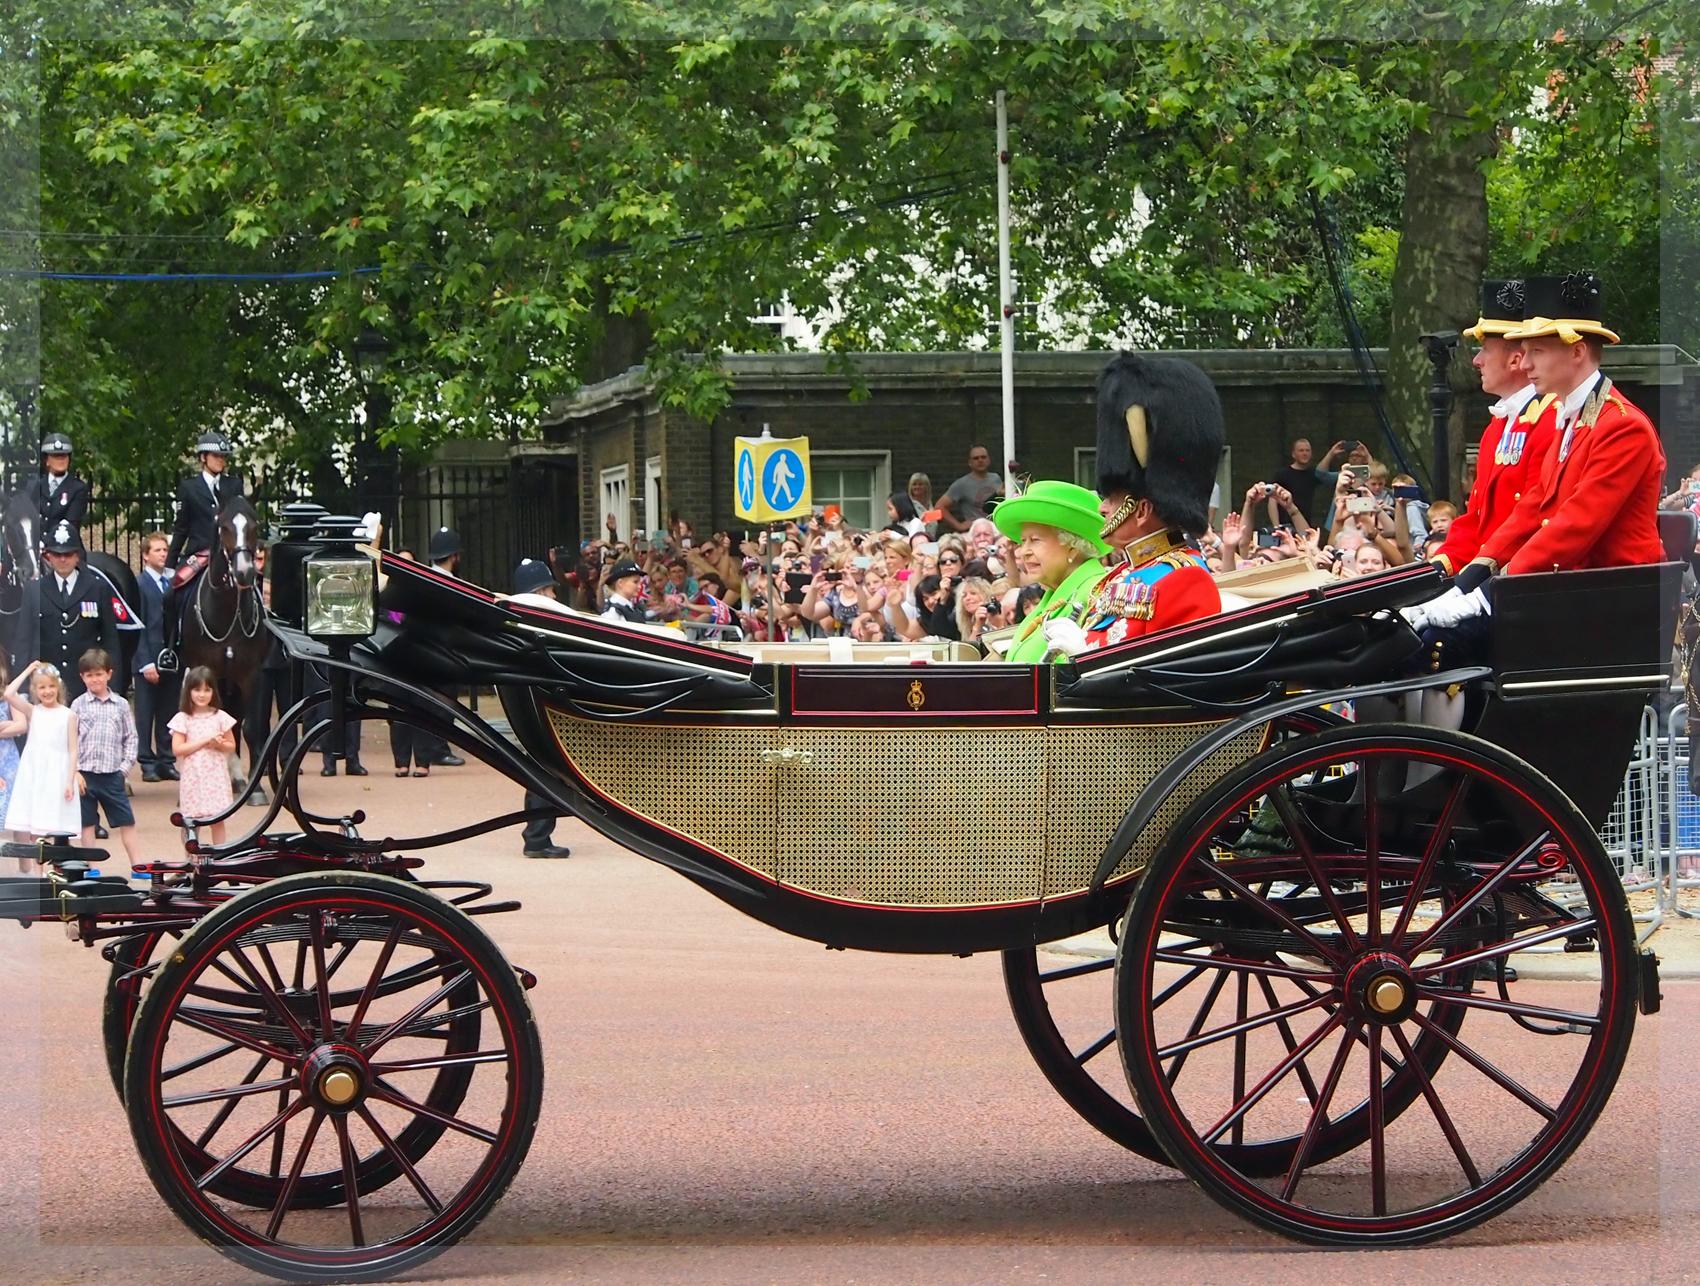 королева и герцог.jpg